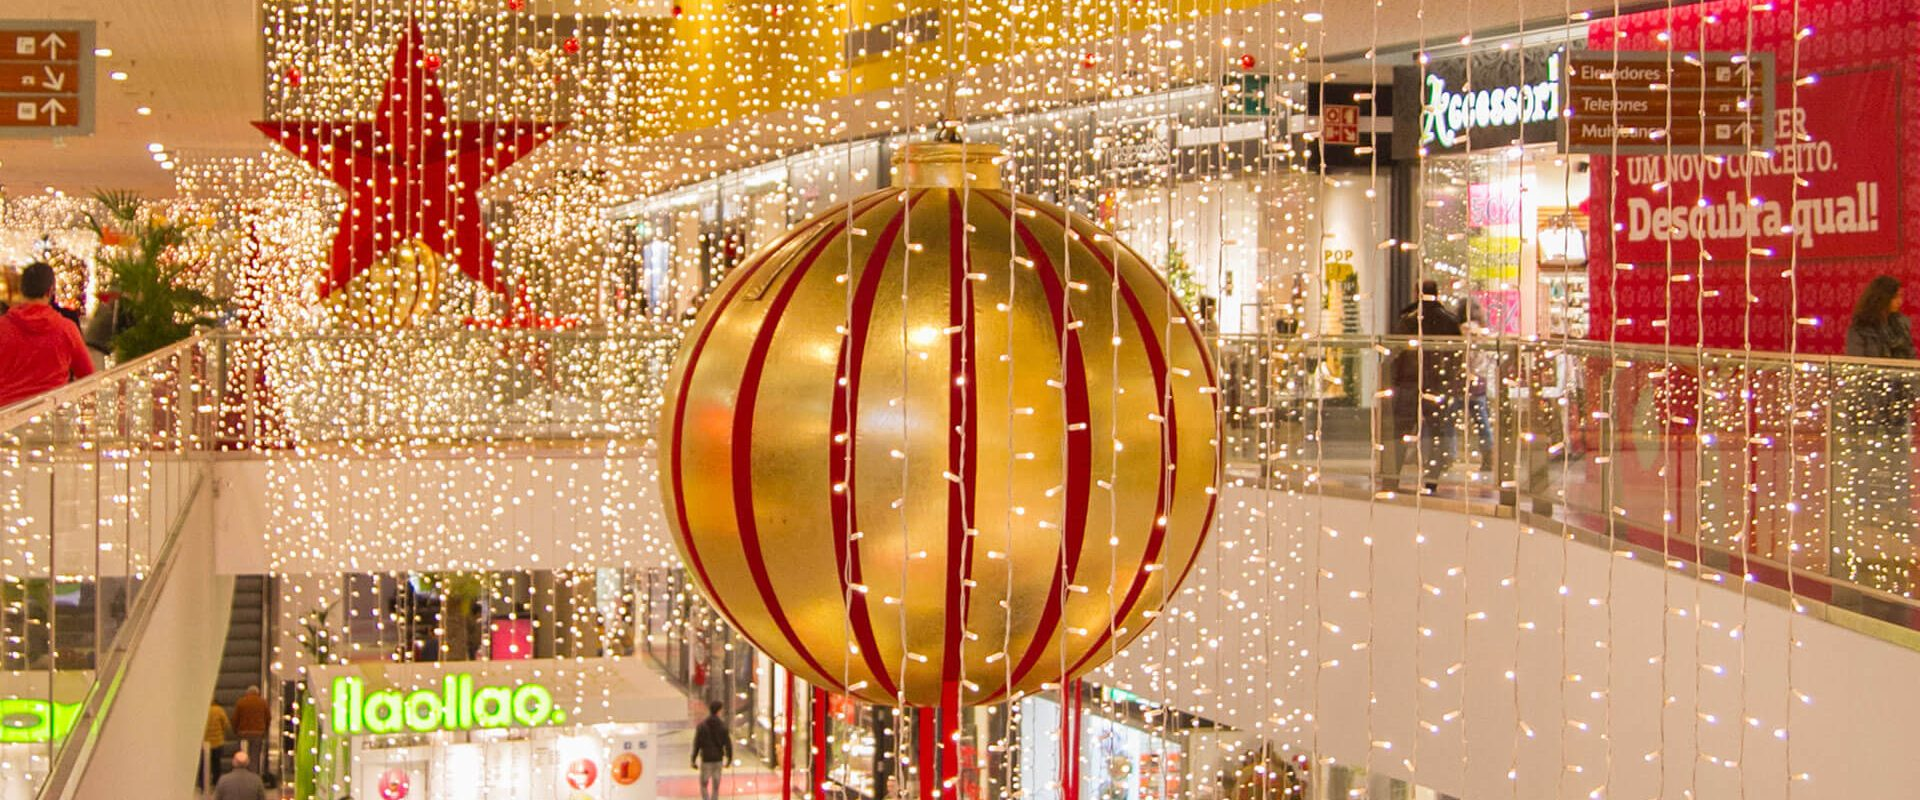 Christmas In Portugal.Mk Illumination Portugal Professional Christmas Festive